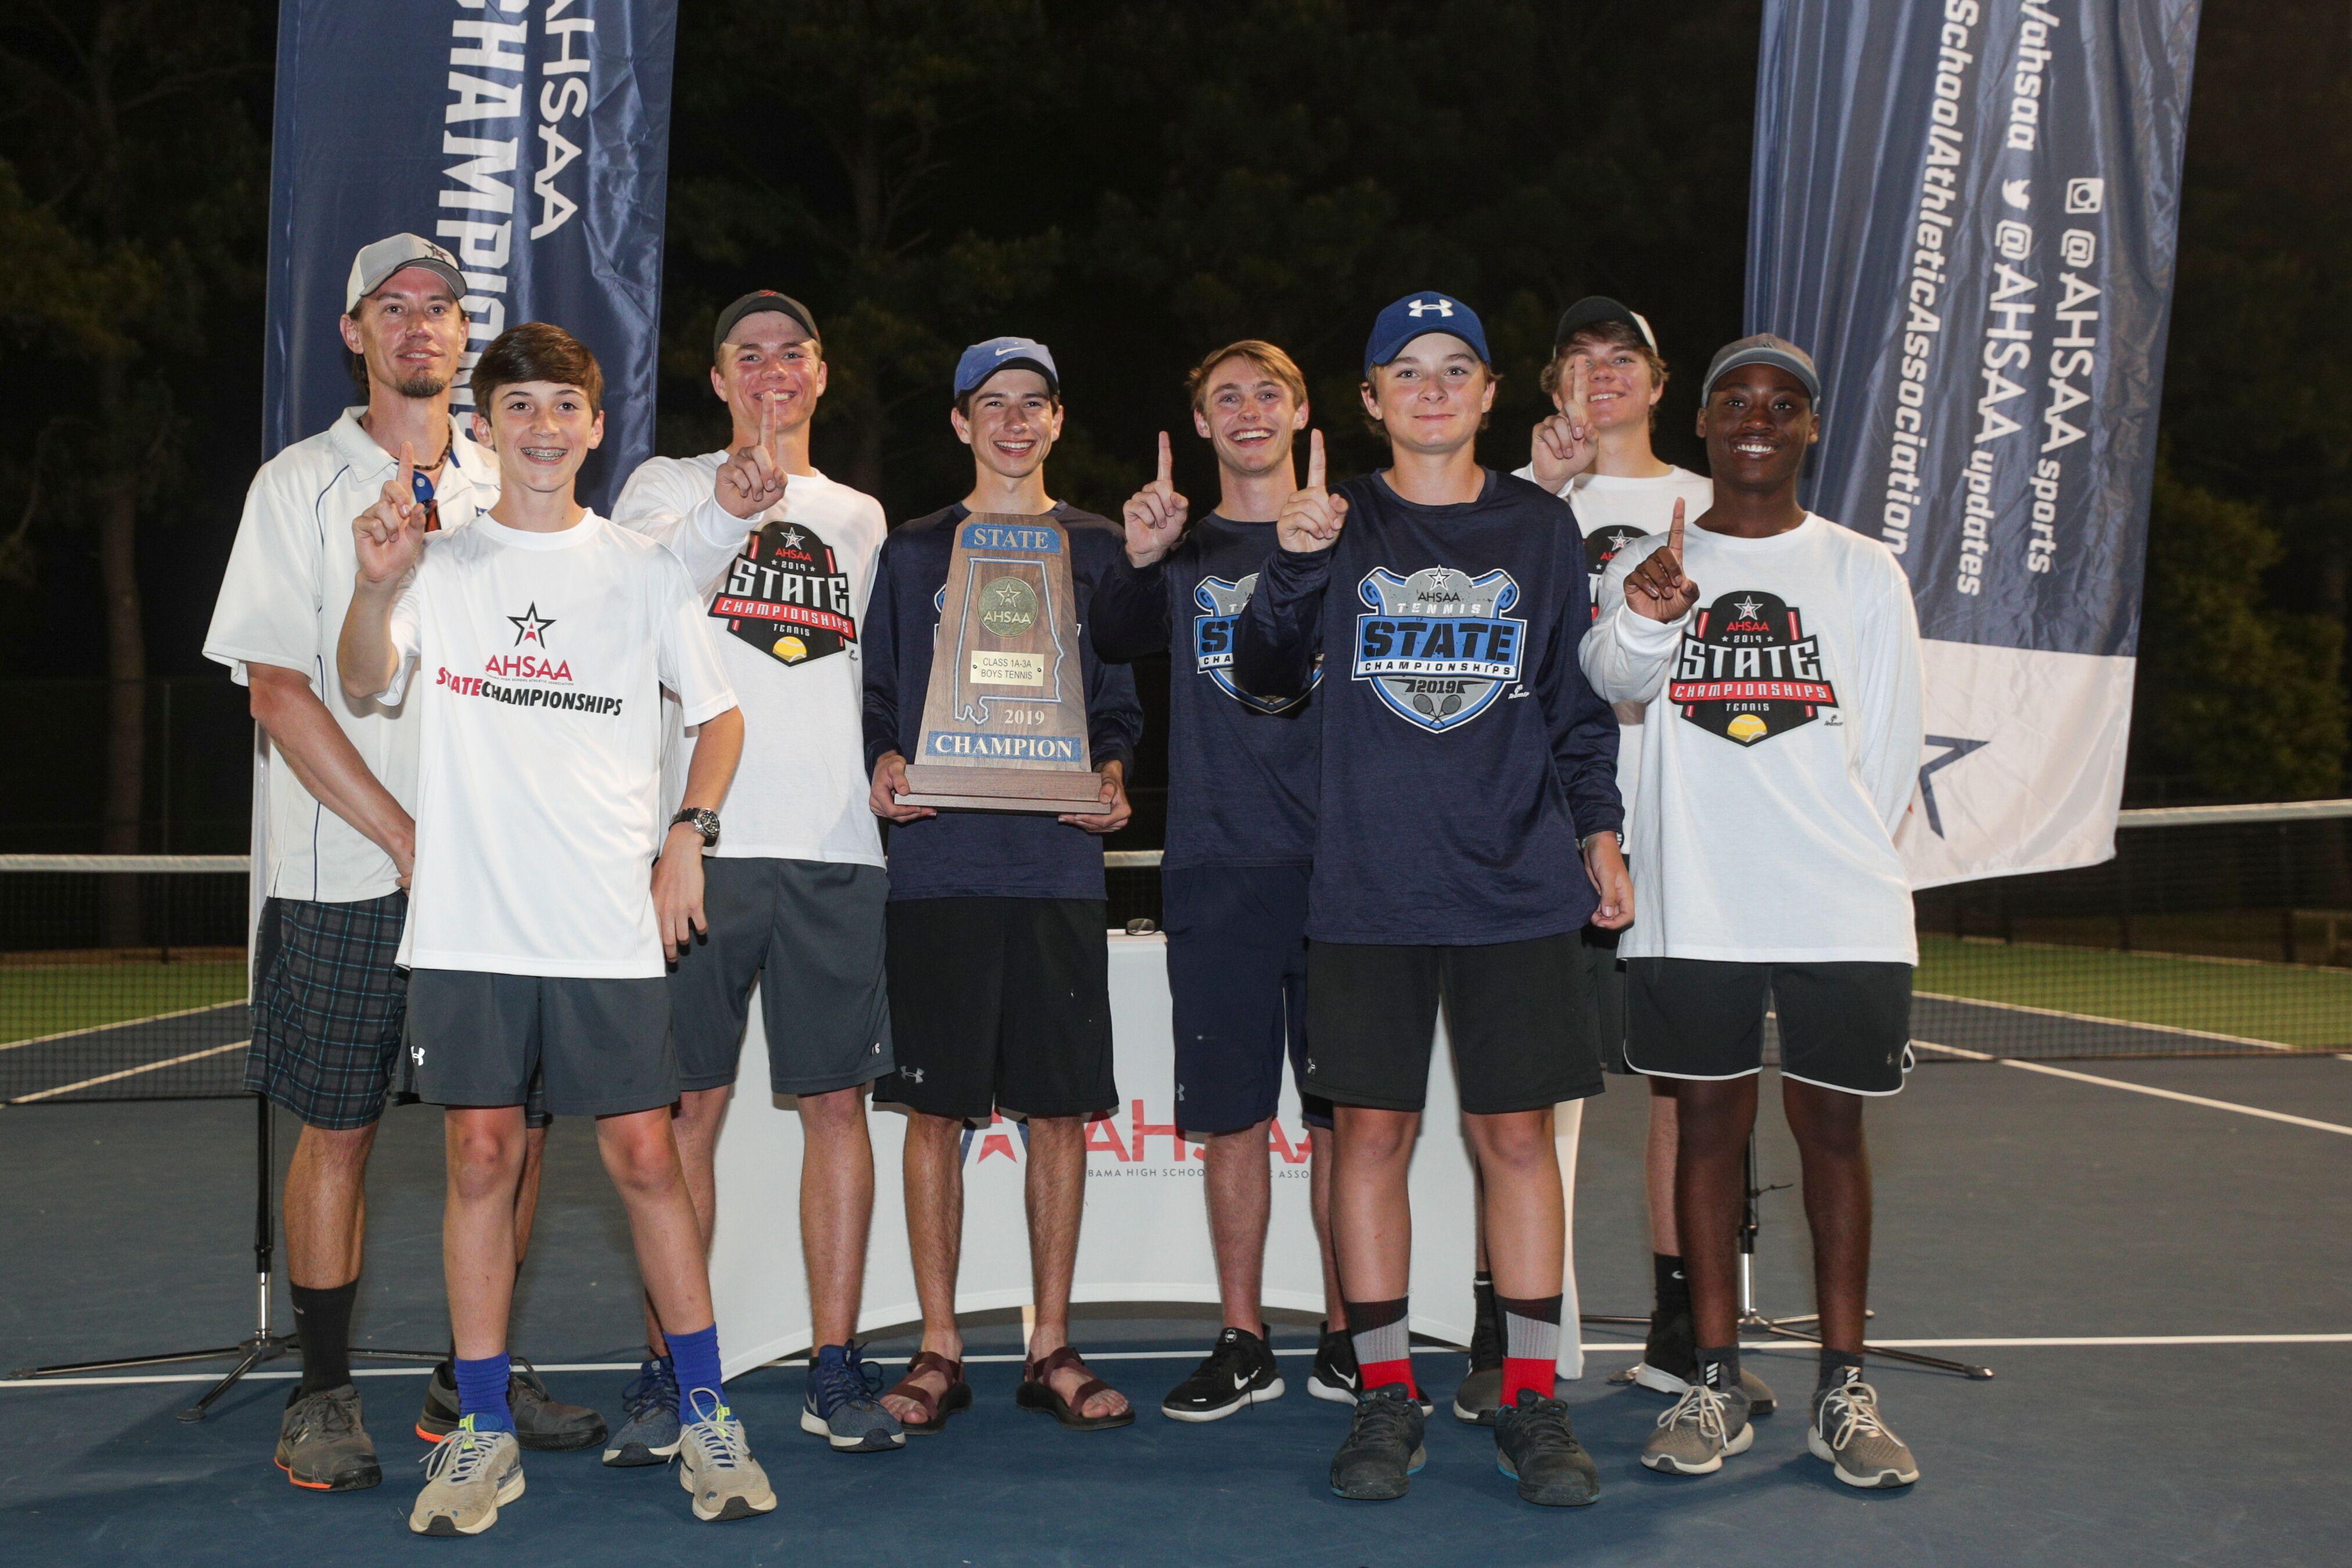 Houston Academy, Saint James Claim AHSAA Class 1A/3A Boys' and Girls' Tennis Championships